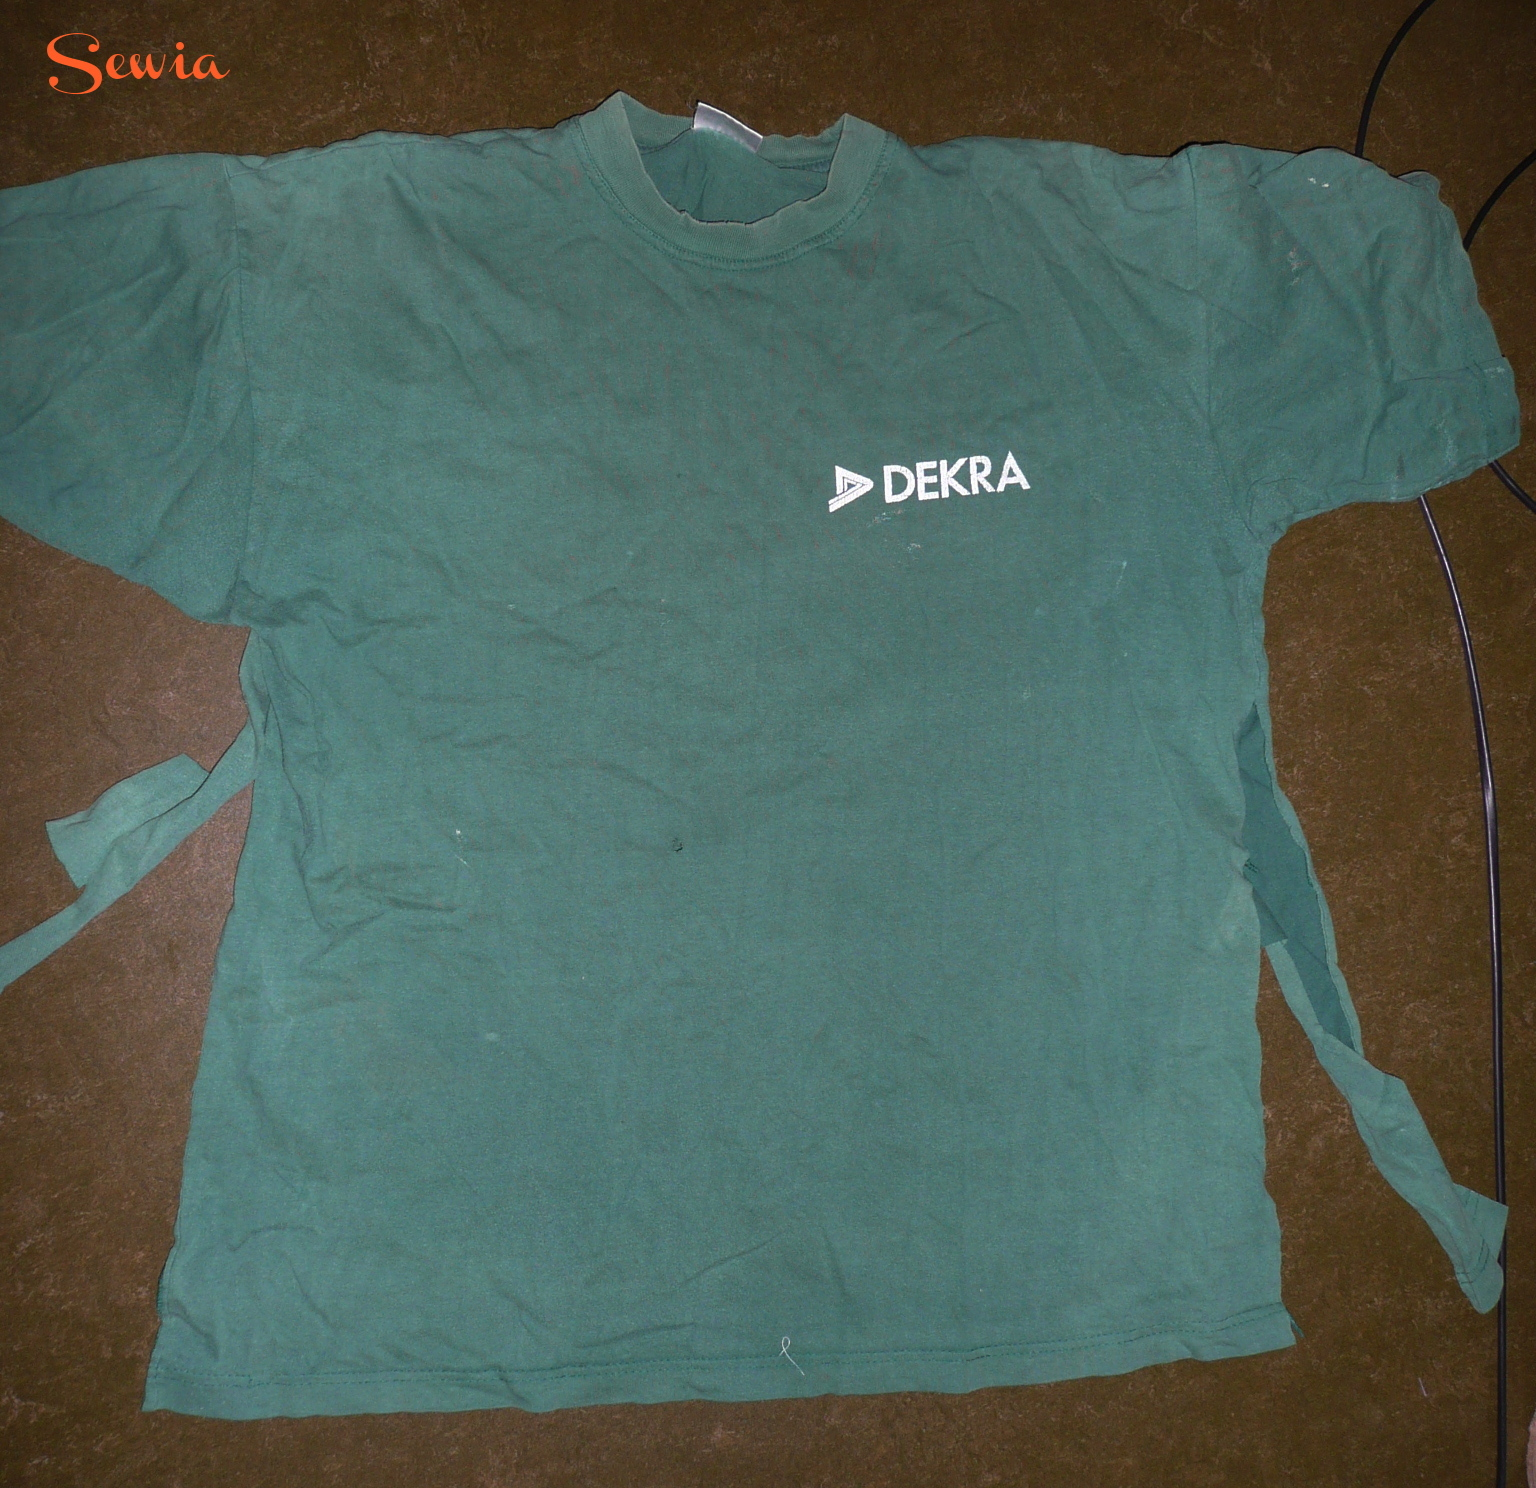 Osterkorb_Shirt_00